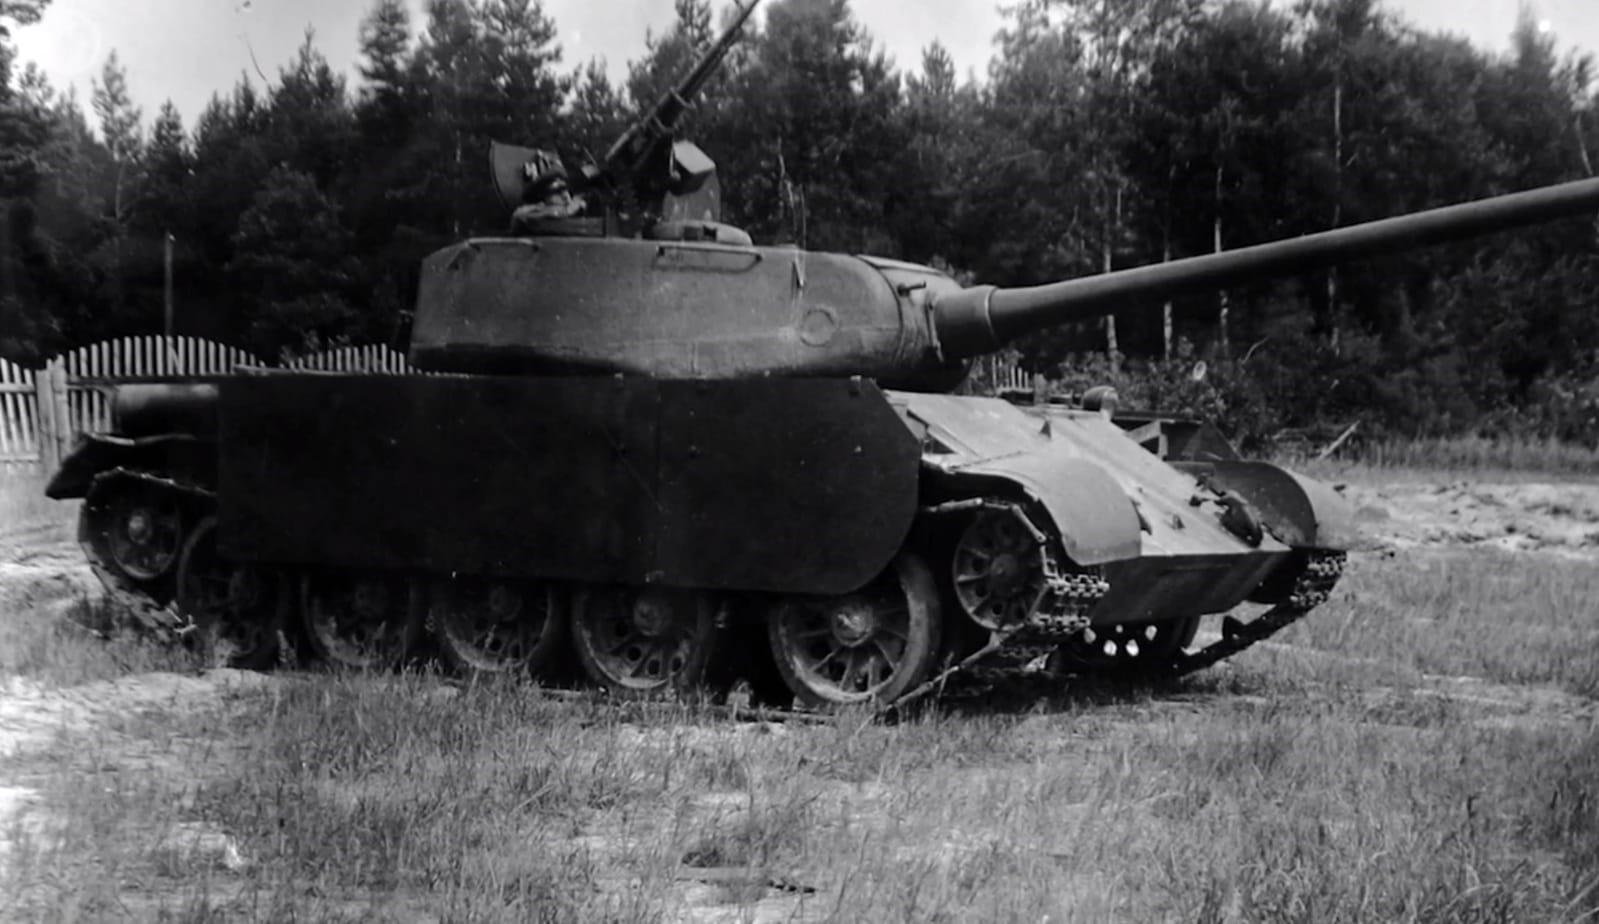 T-44 Tank